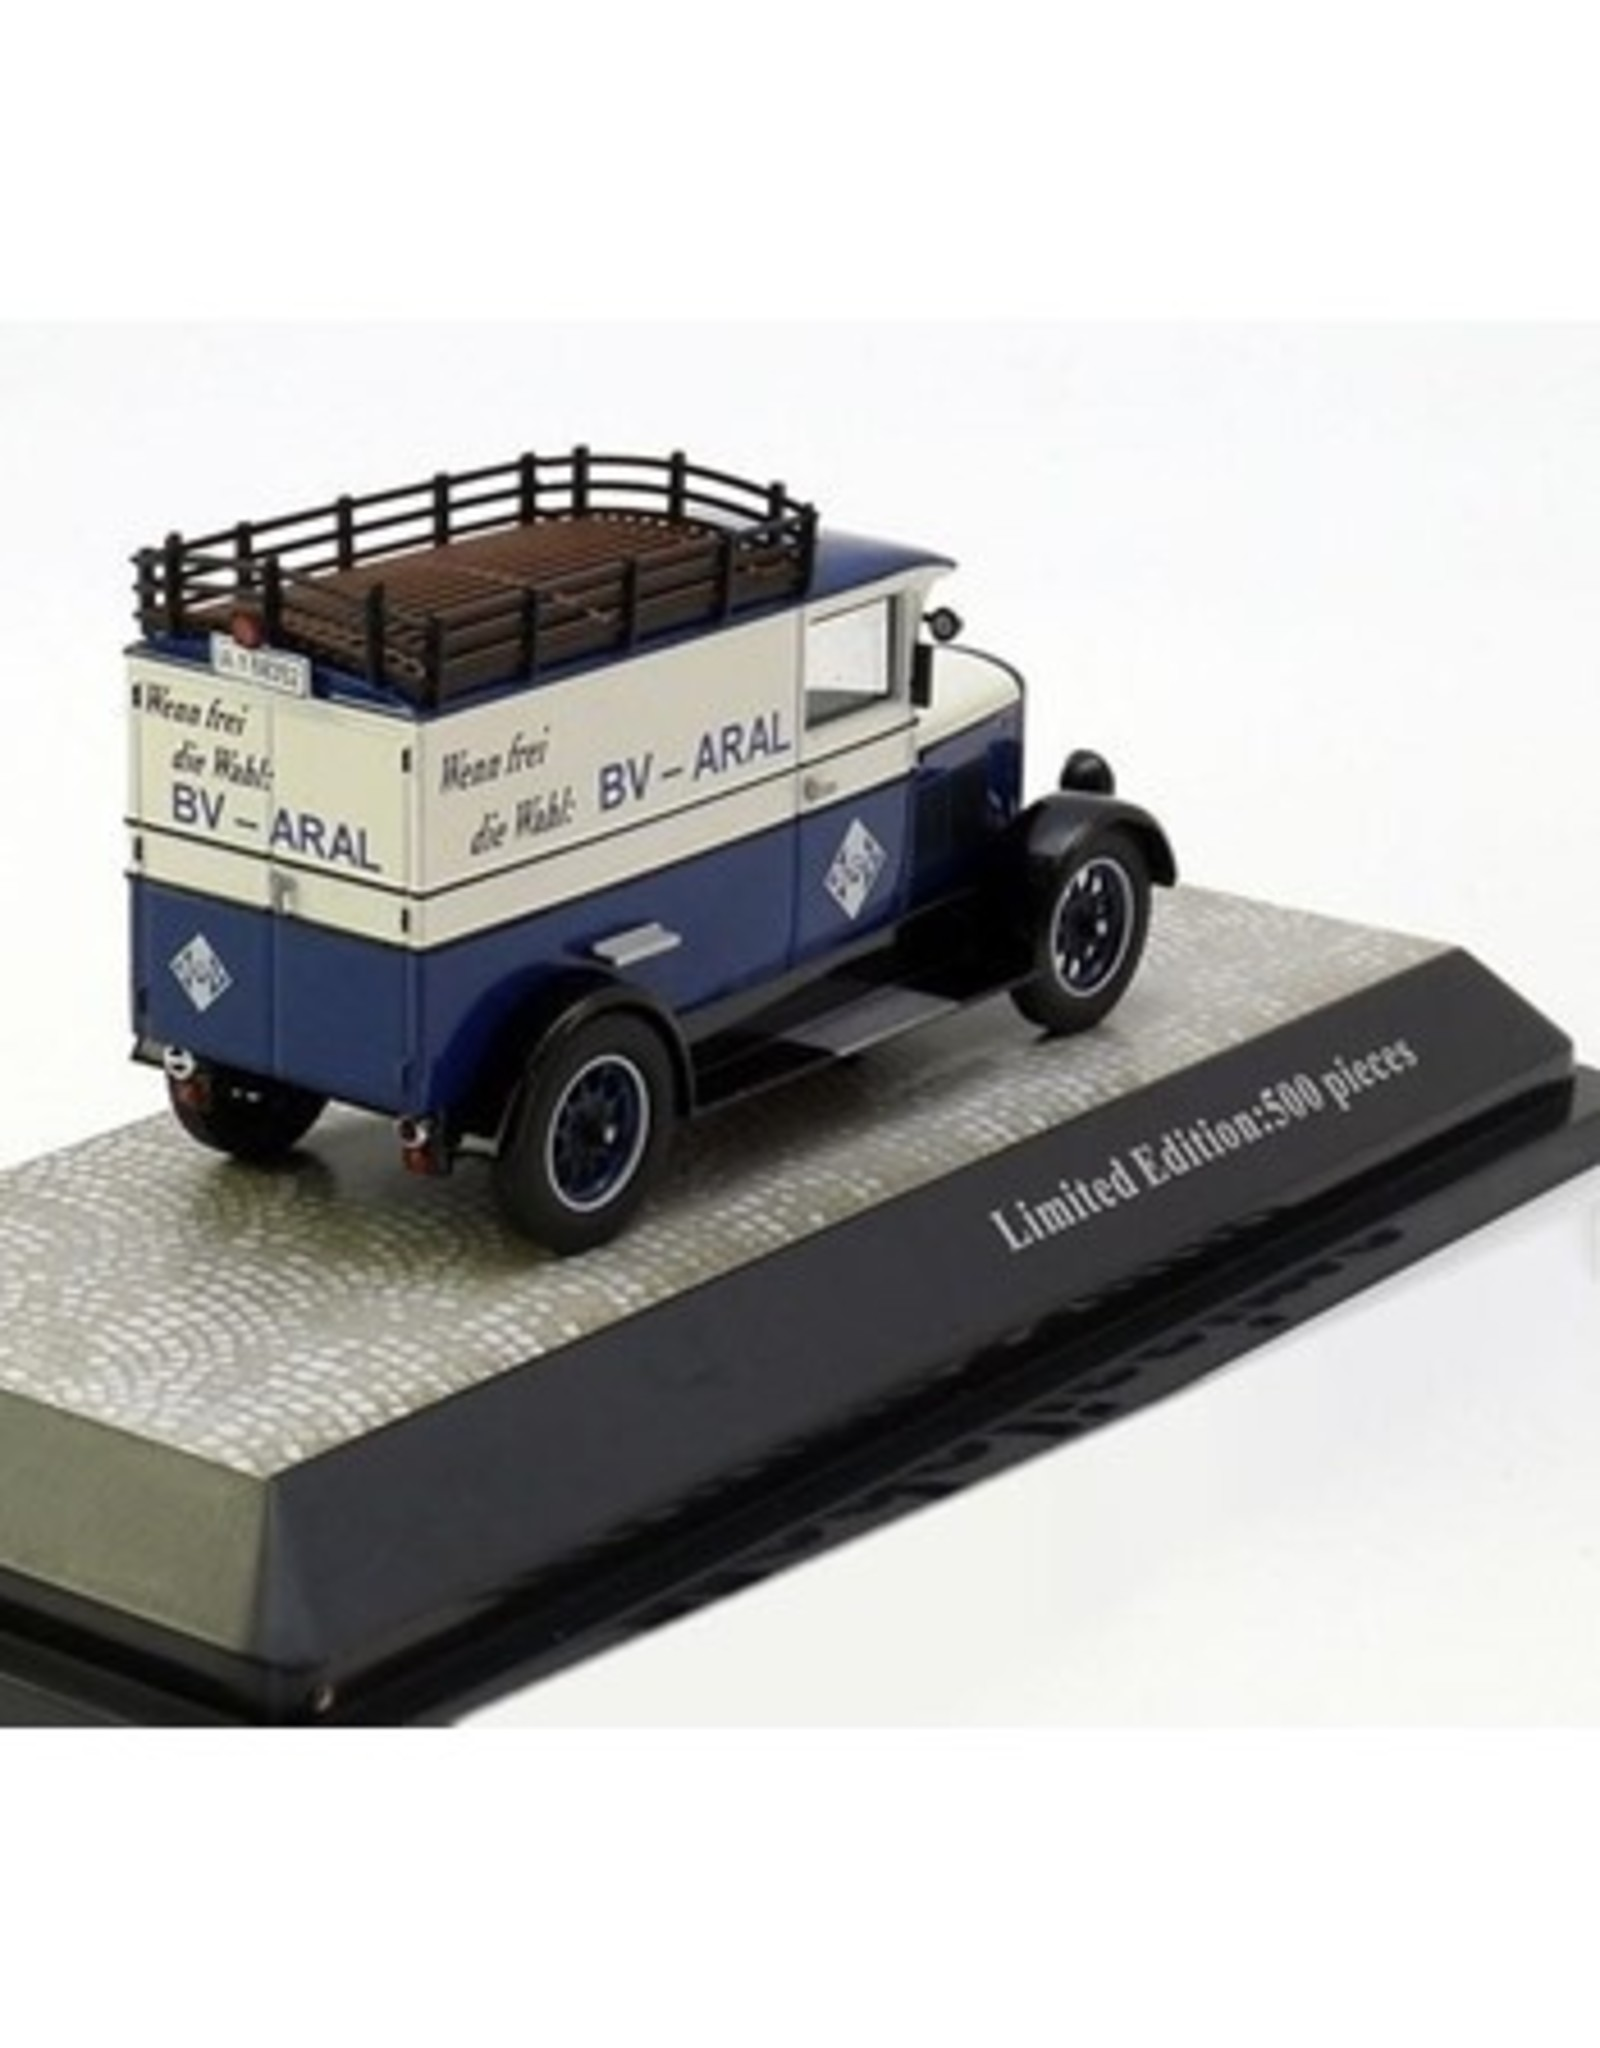 Phänomen Phänomen Granit 25 Van 'ARAL' - 1:43 - Premium ClassiXXs